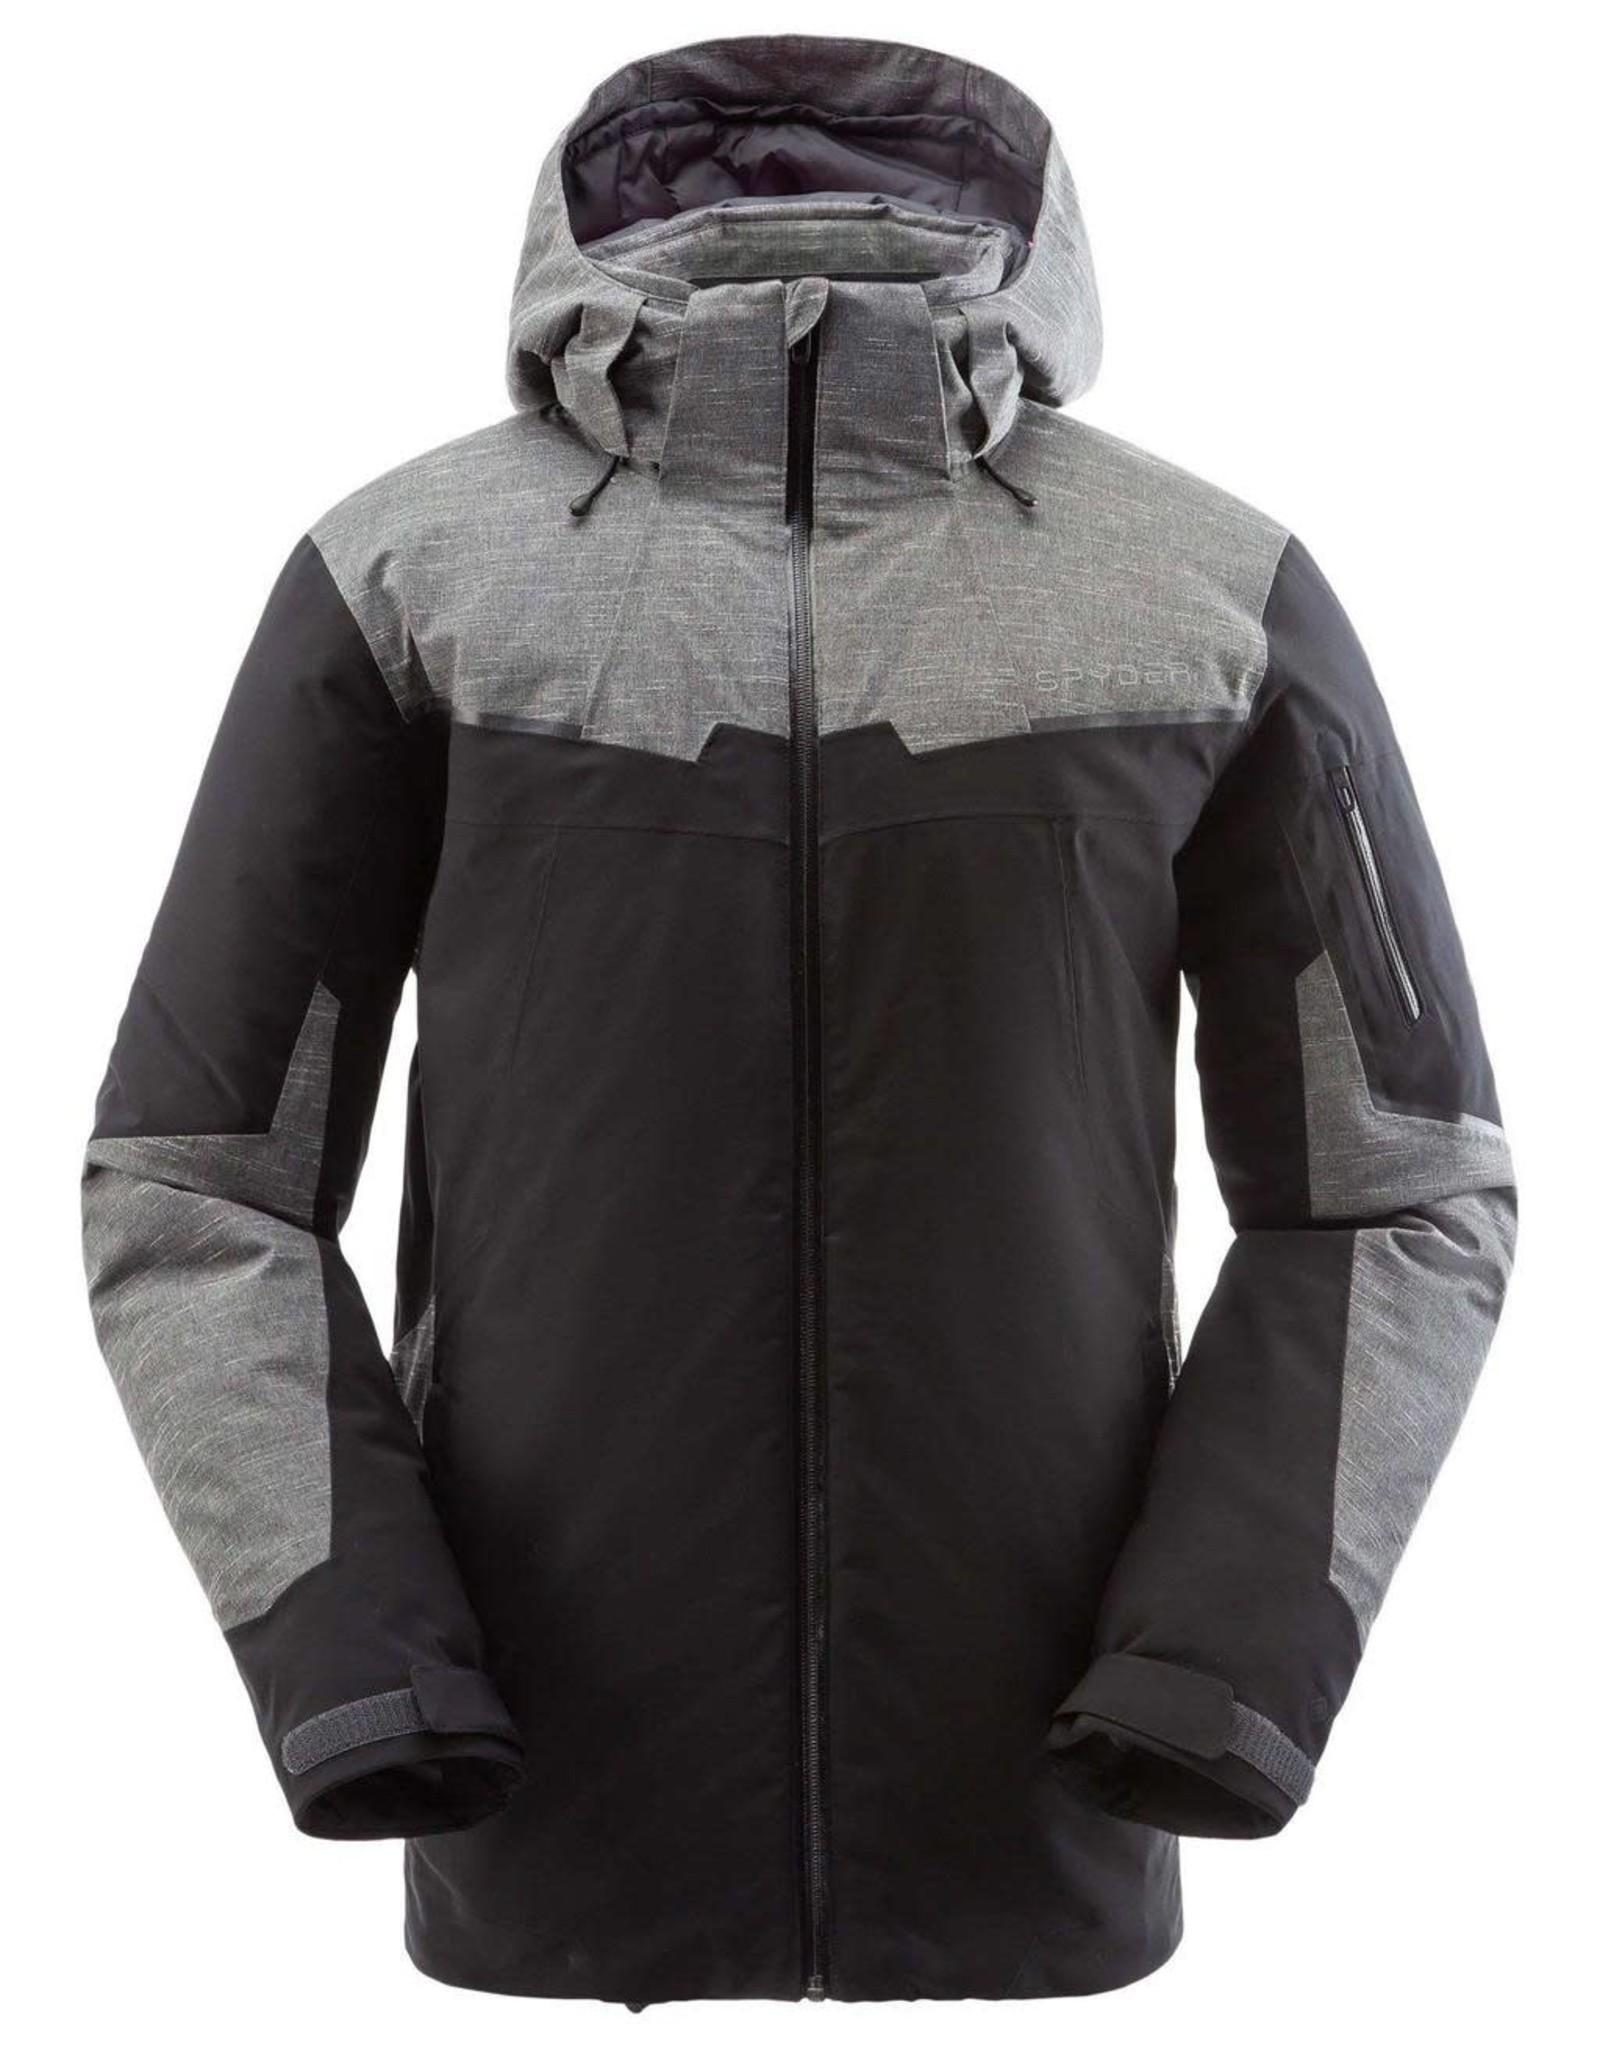 Spyder men's chamber jacket